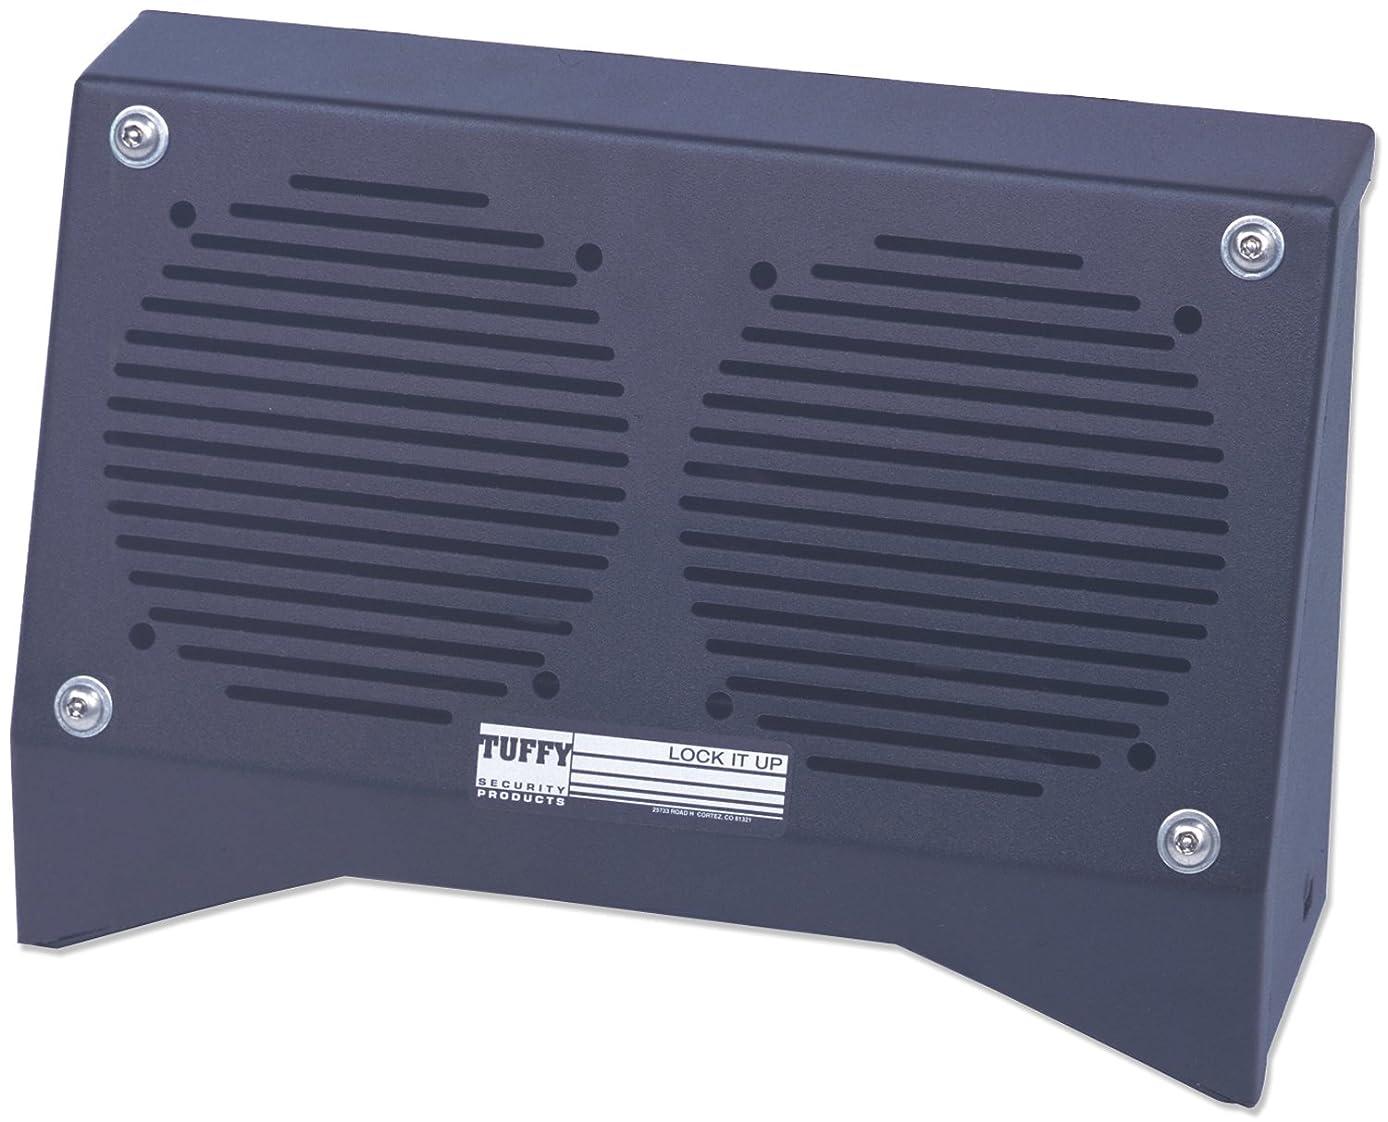 Tuffy 065-01 Dual Speaker Box - Black